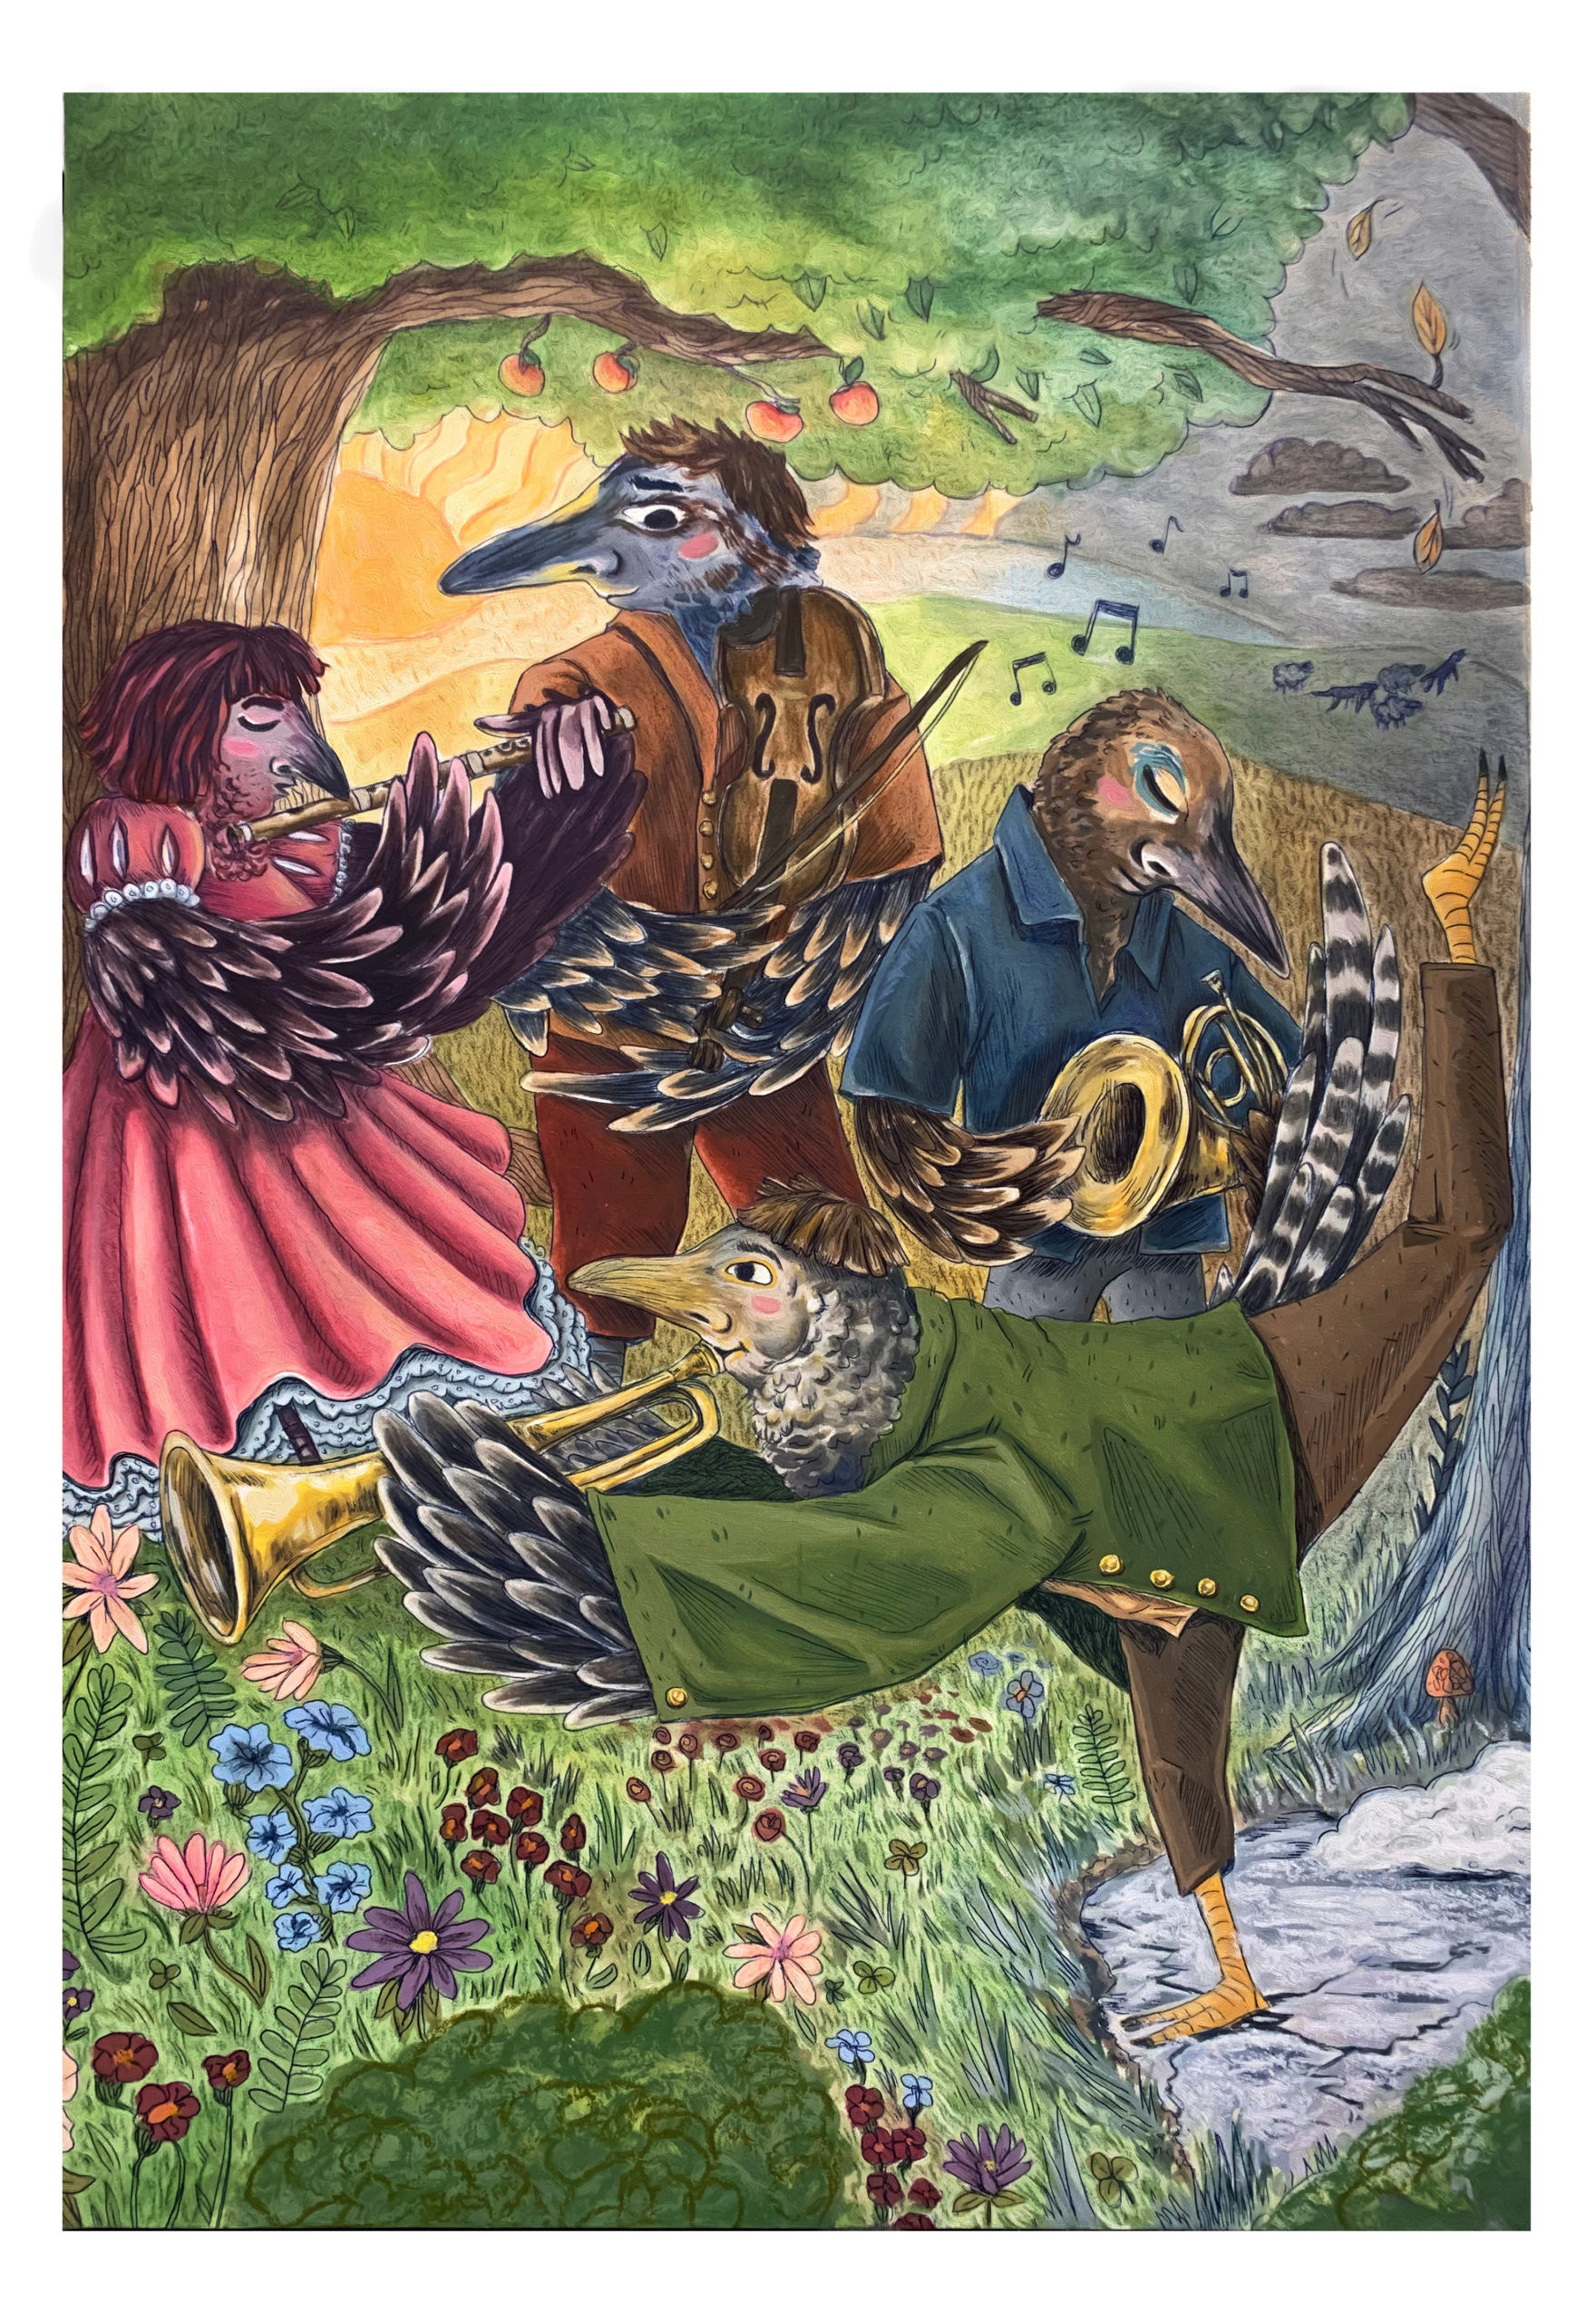 Vivaldi Four Seasons student artwork from MassArt, Jen Treadway